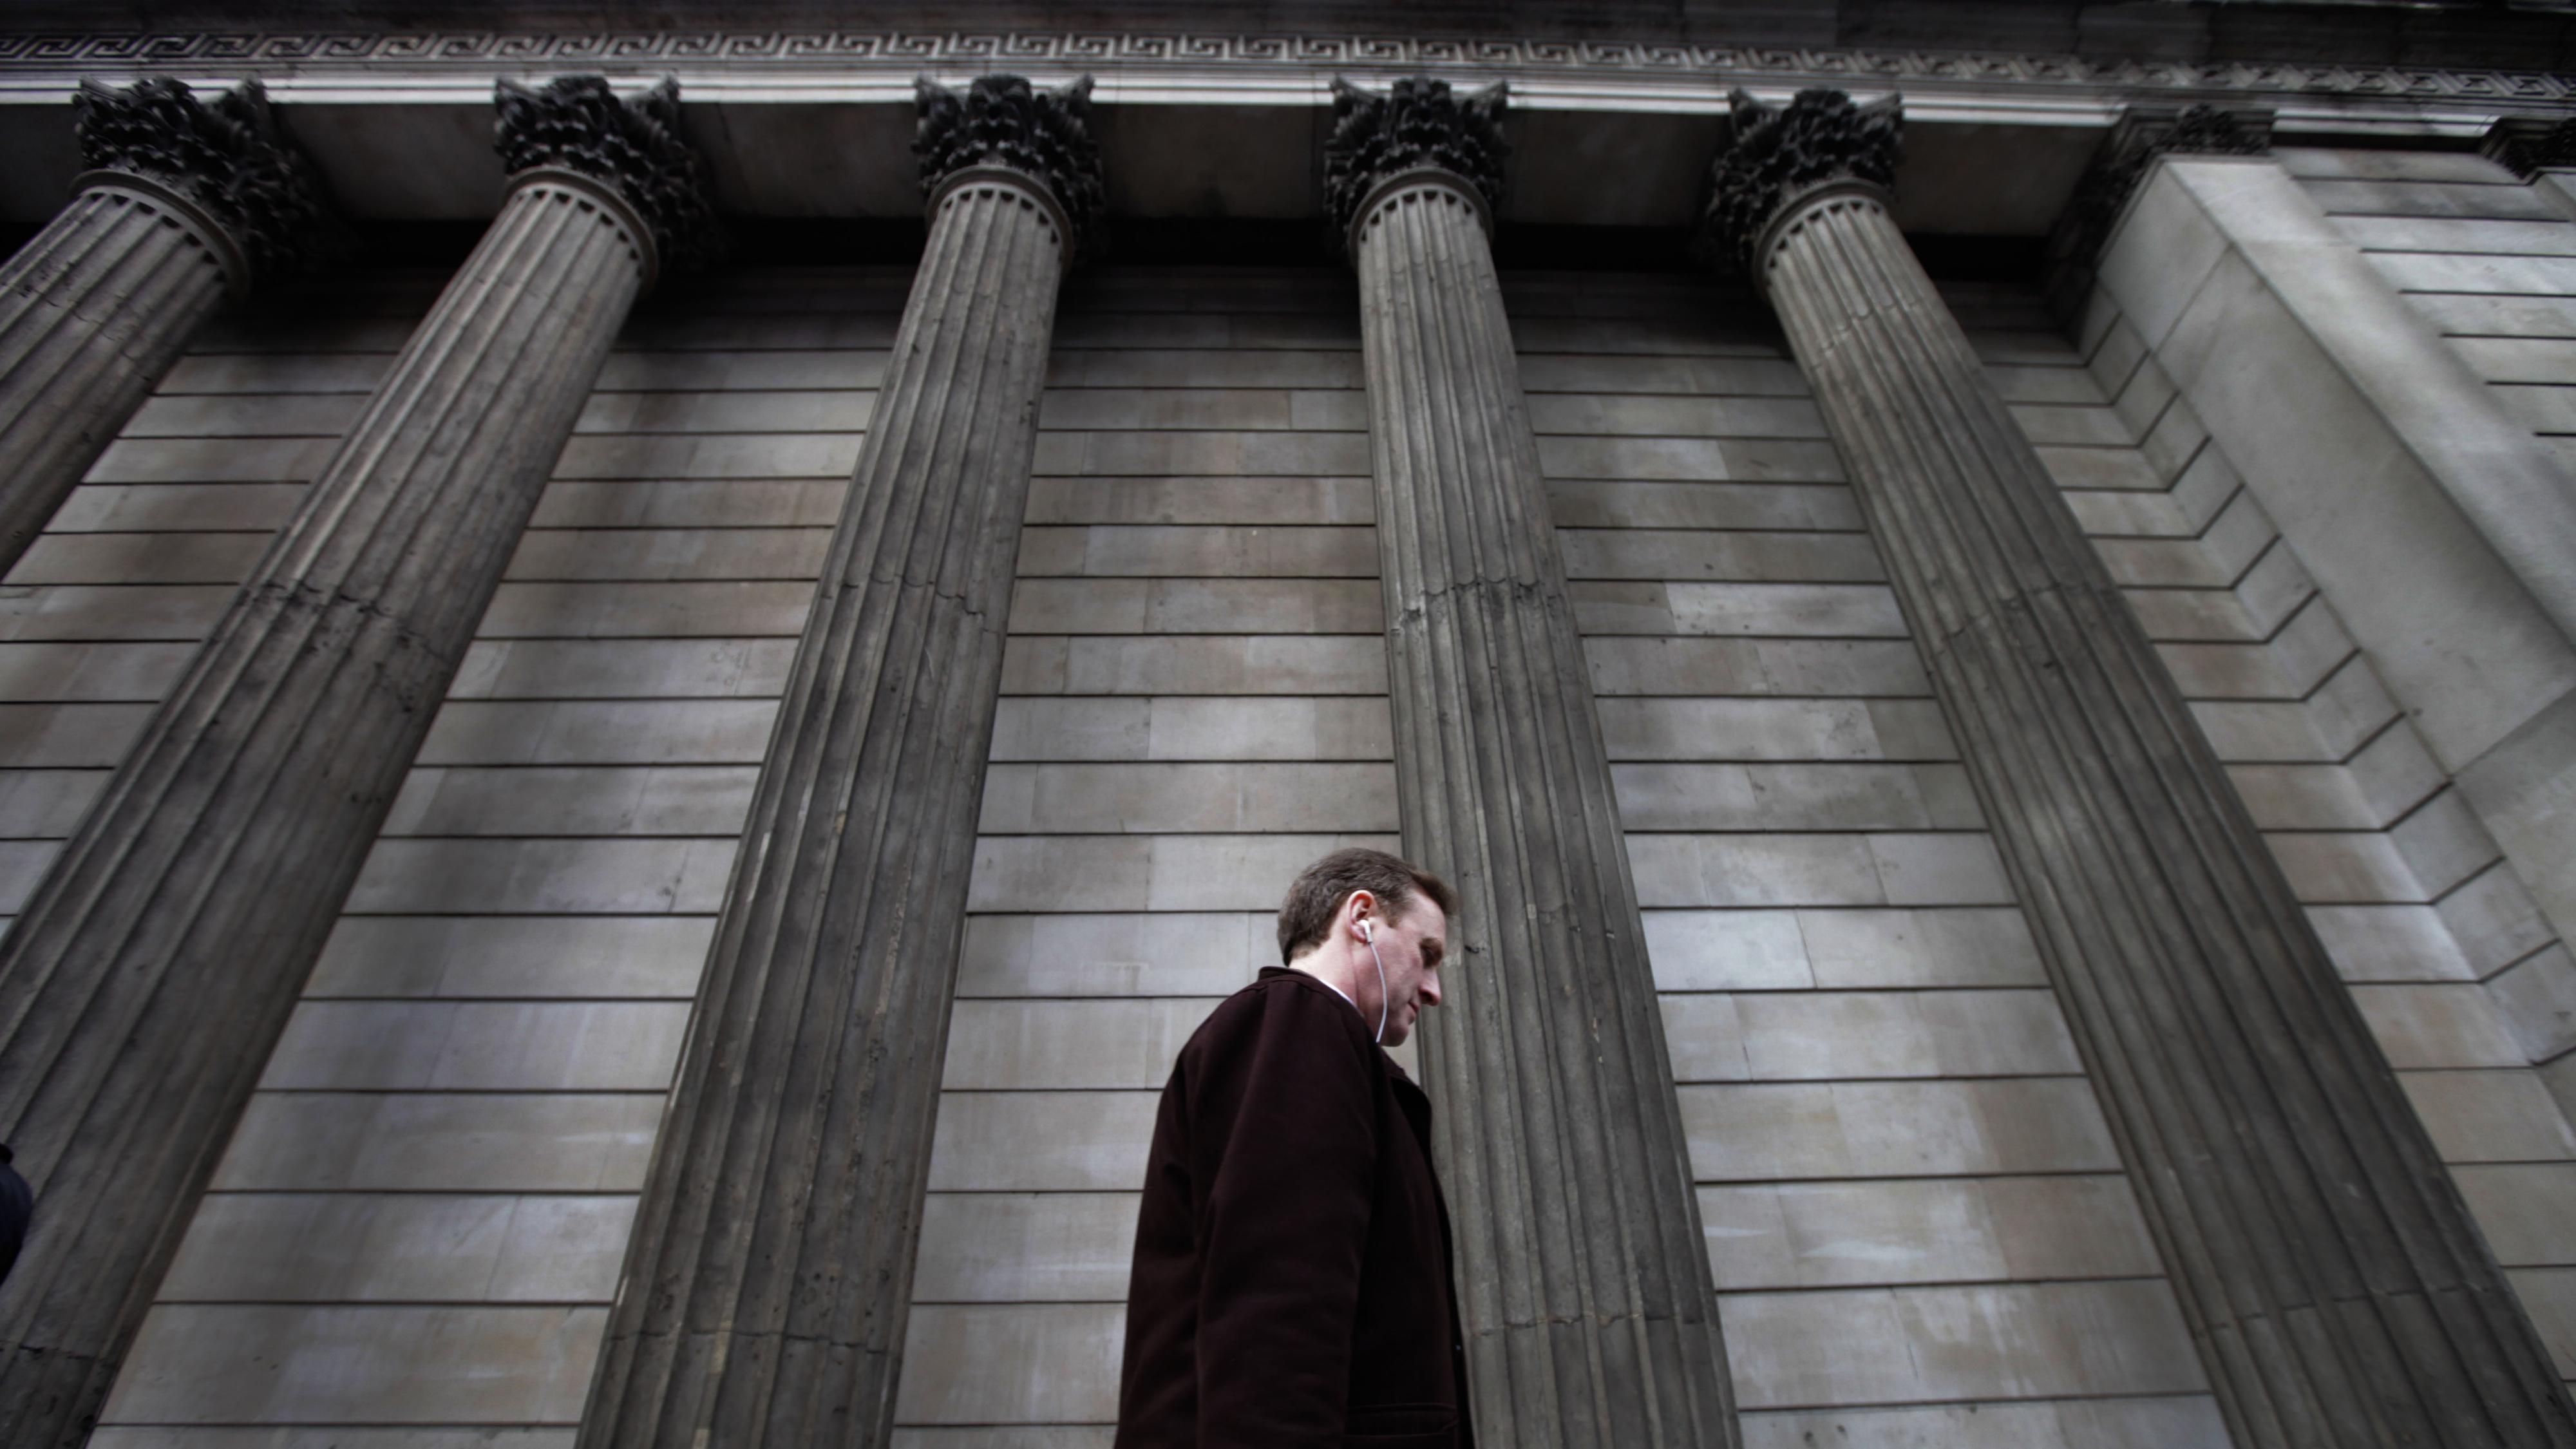 uk banks capital regulations